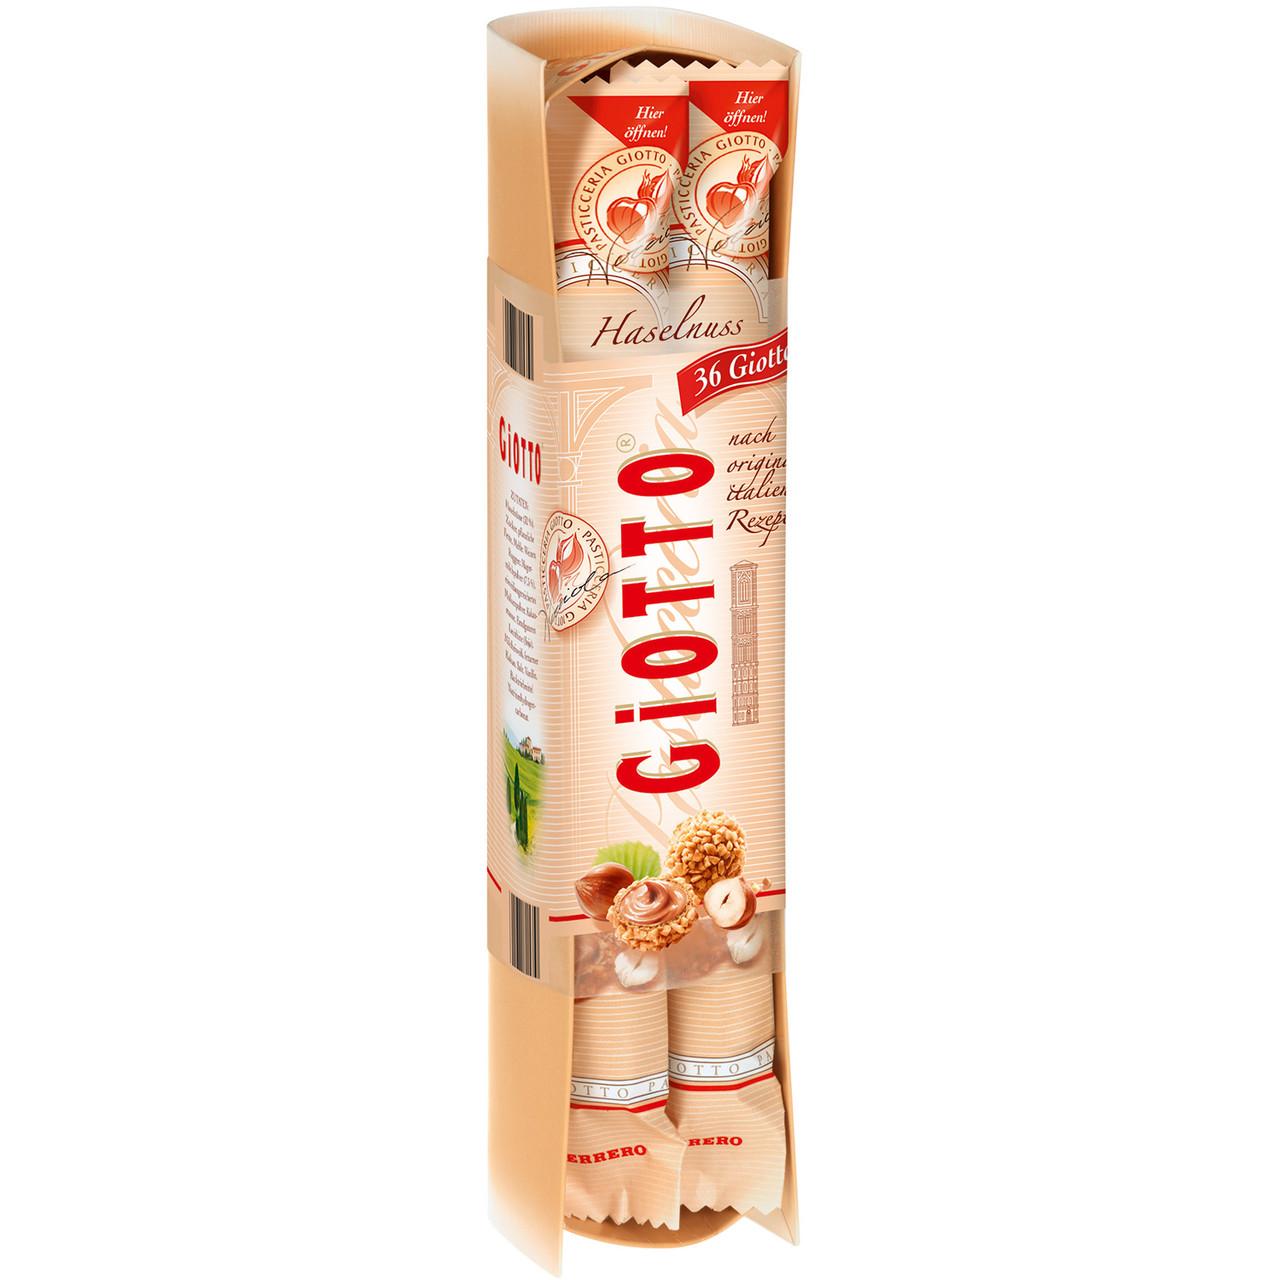 Шоколадные конфеты Giotto Ferrero Hazelnuss